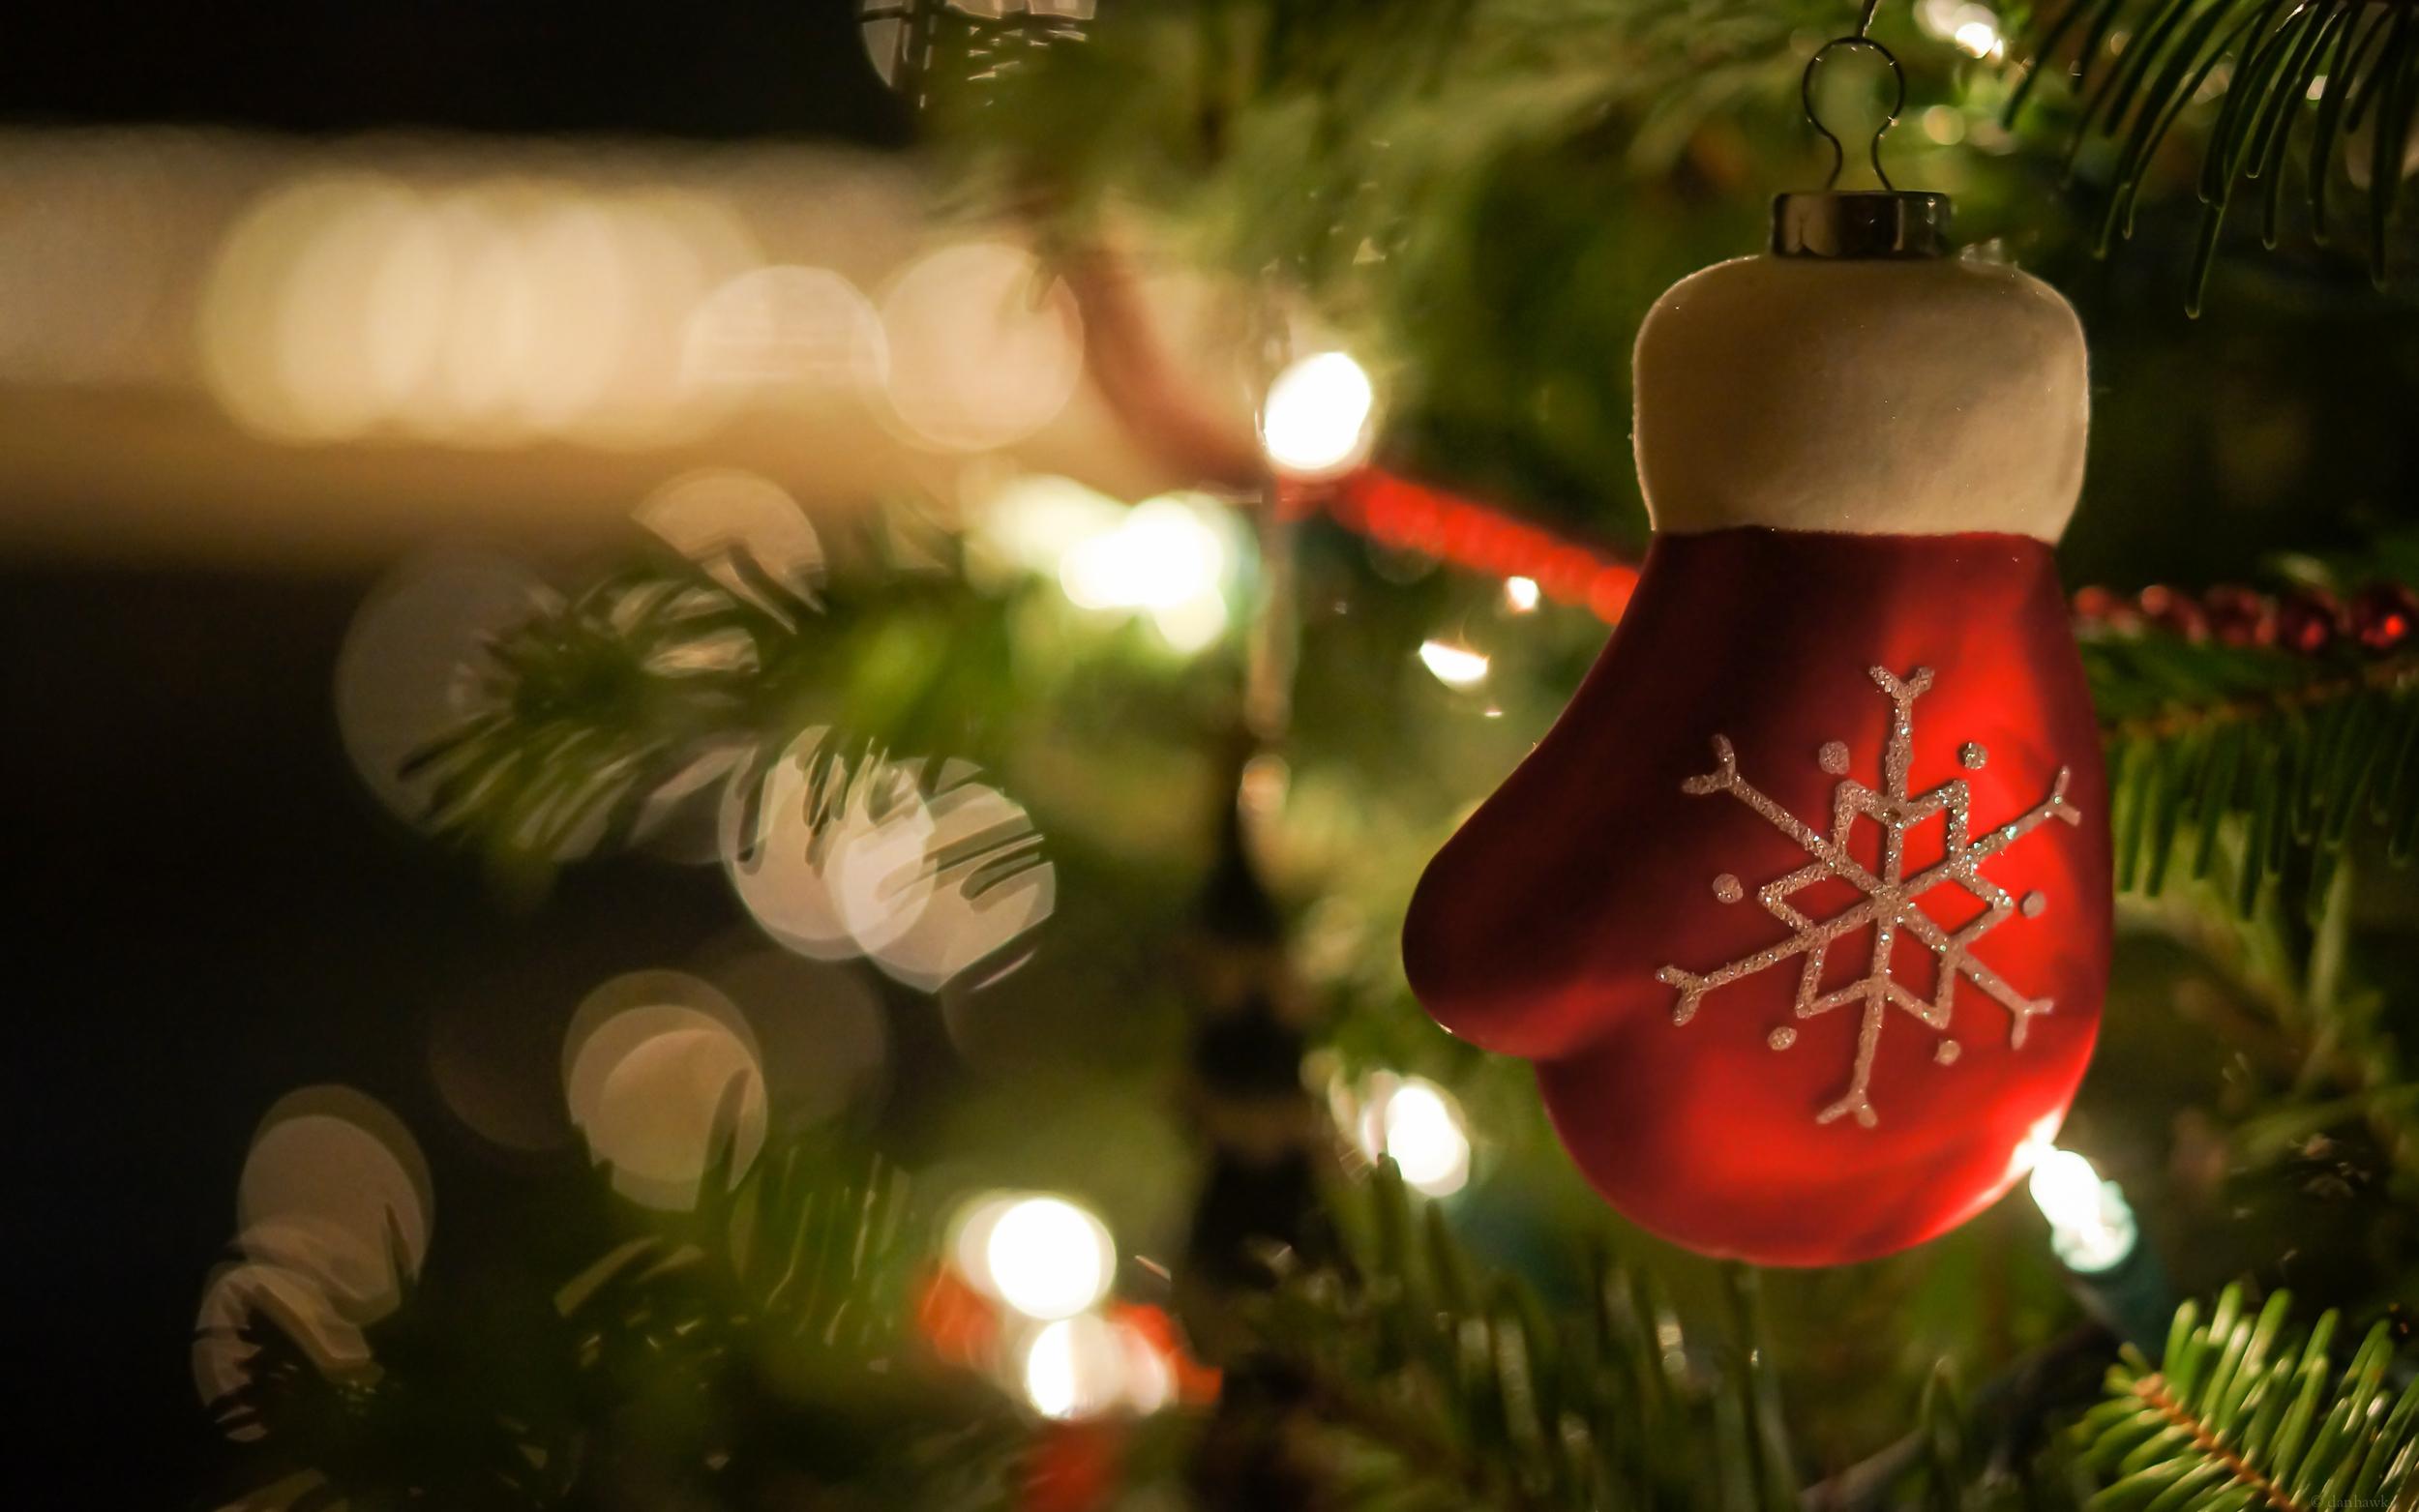 Christmas Mood | 365 Project | Dec 15th, 2012  Downloads |  Desktop  |  iPad